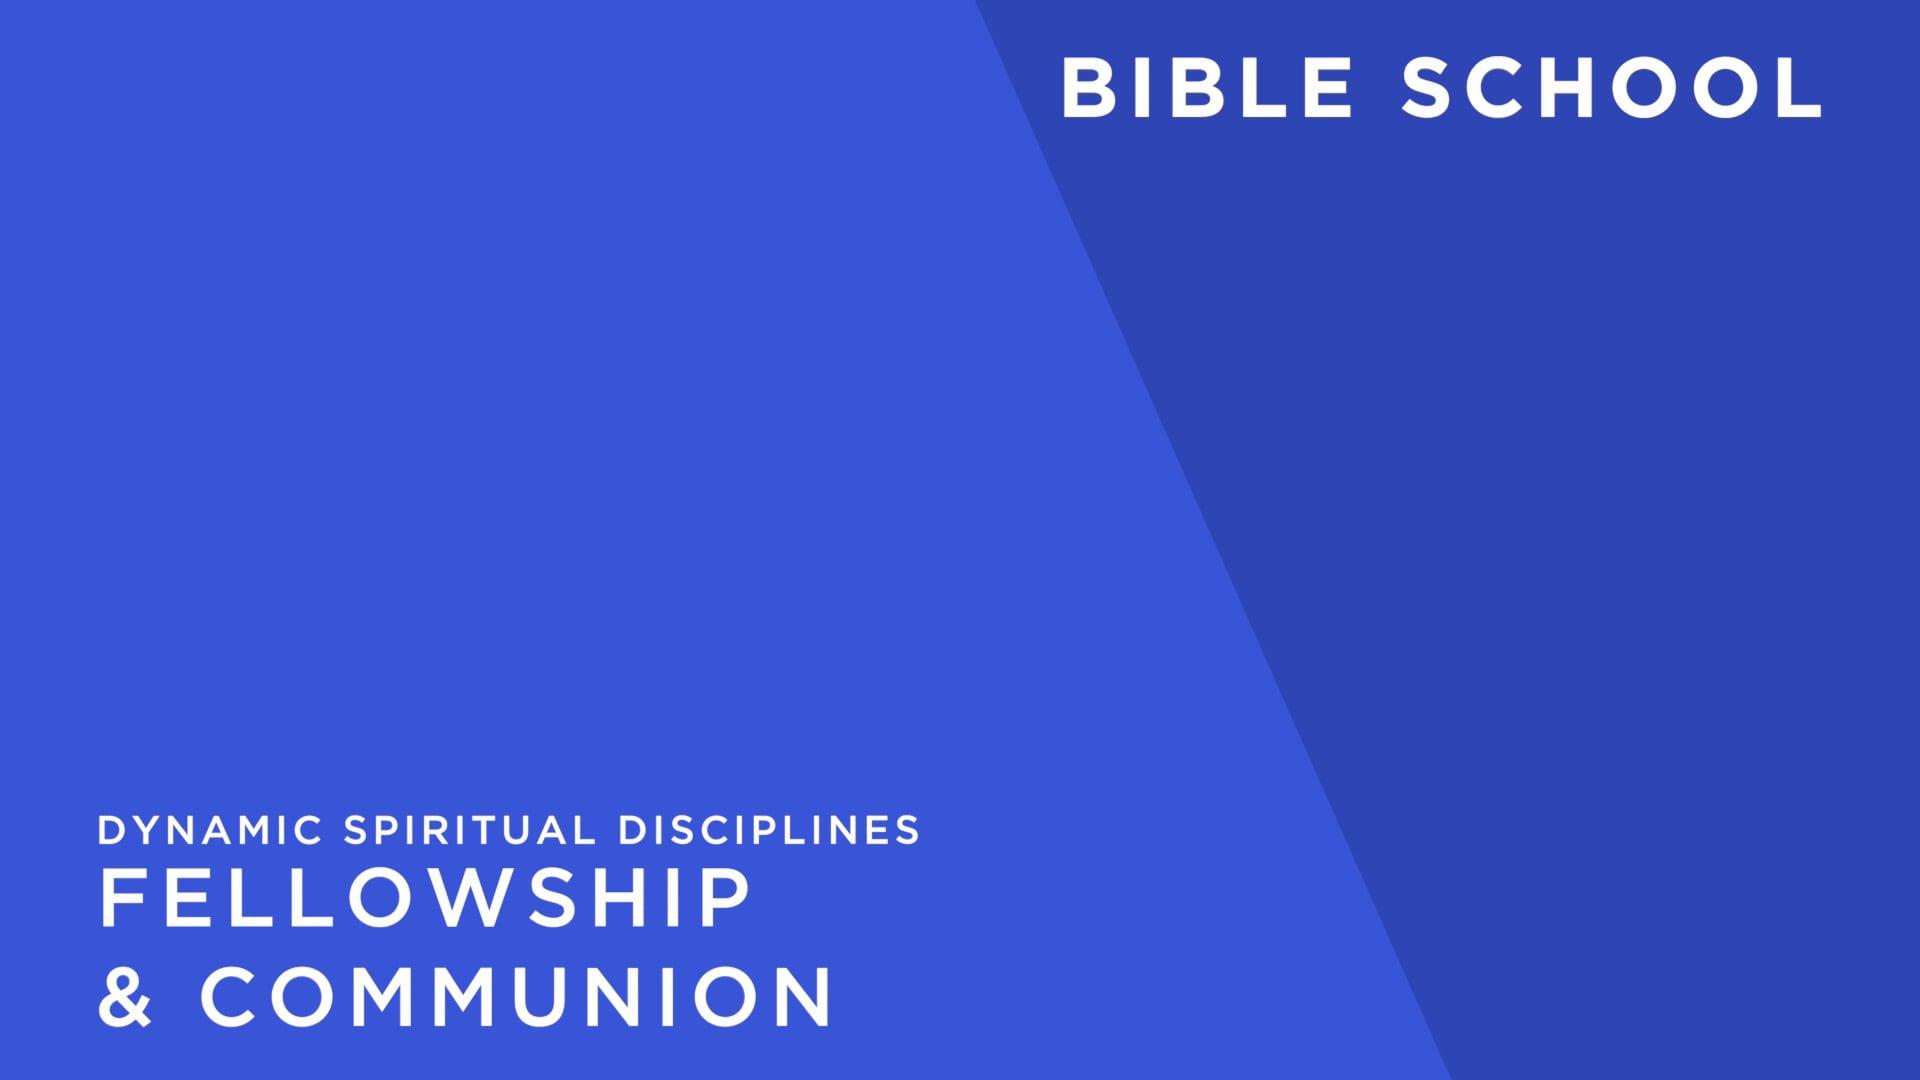 Fellowship and Communion